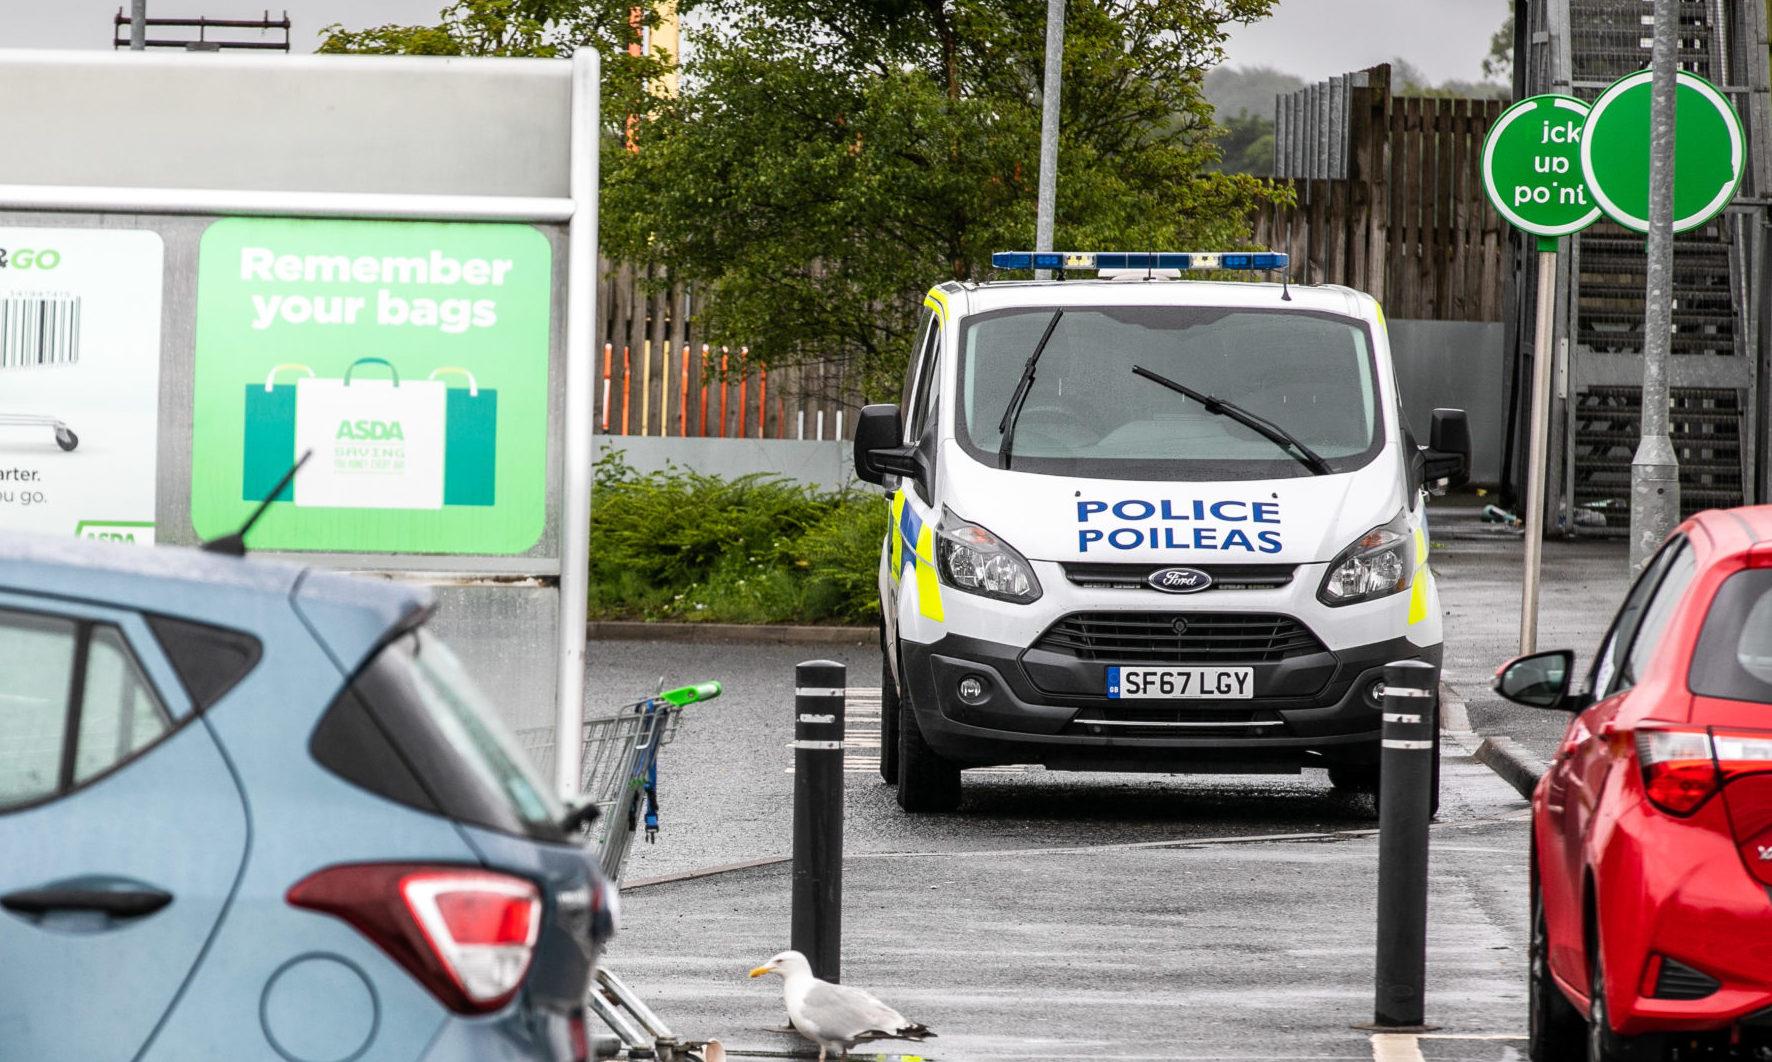 A police van outside the Glenrothes Asda on Thursday.